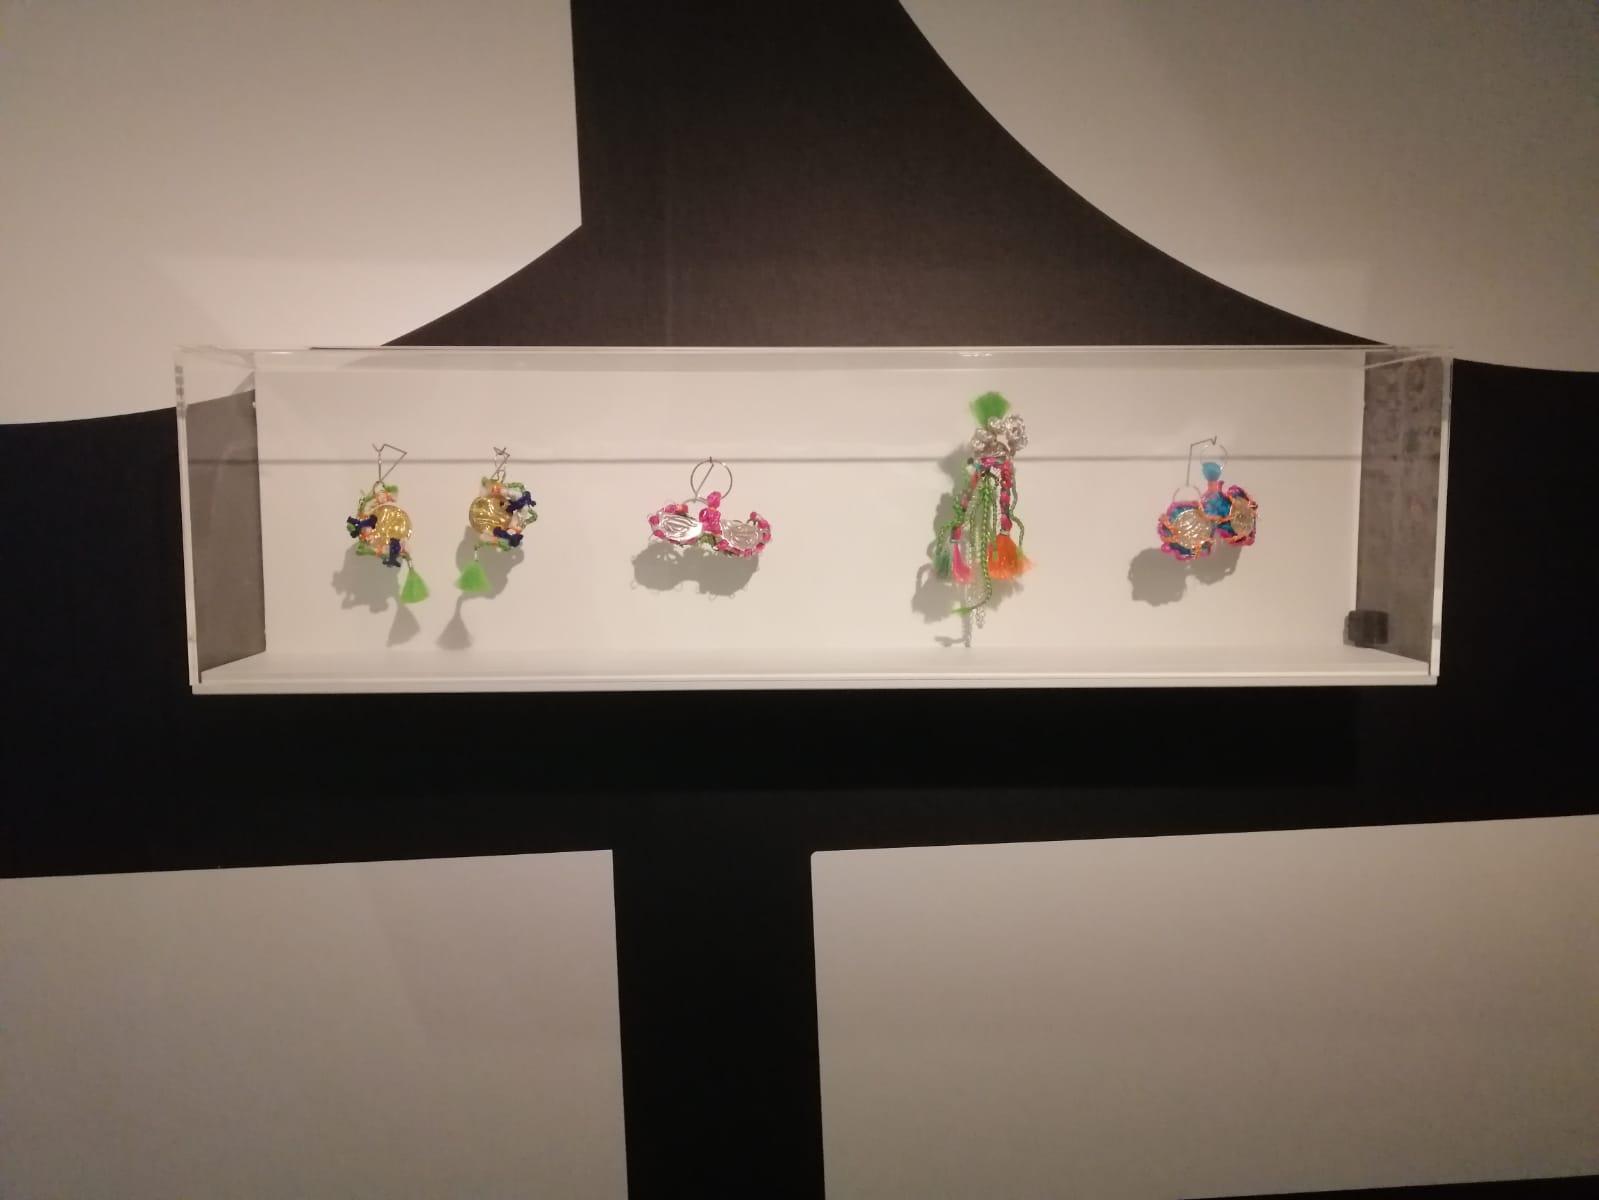 Kalkidan Hoex, oorsieraden. Voices of Fashion, Centraal Museum, 2021, tentoonstelling, wandvitrine